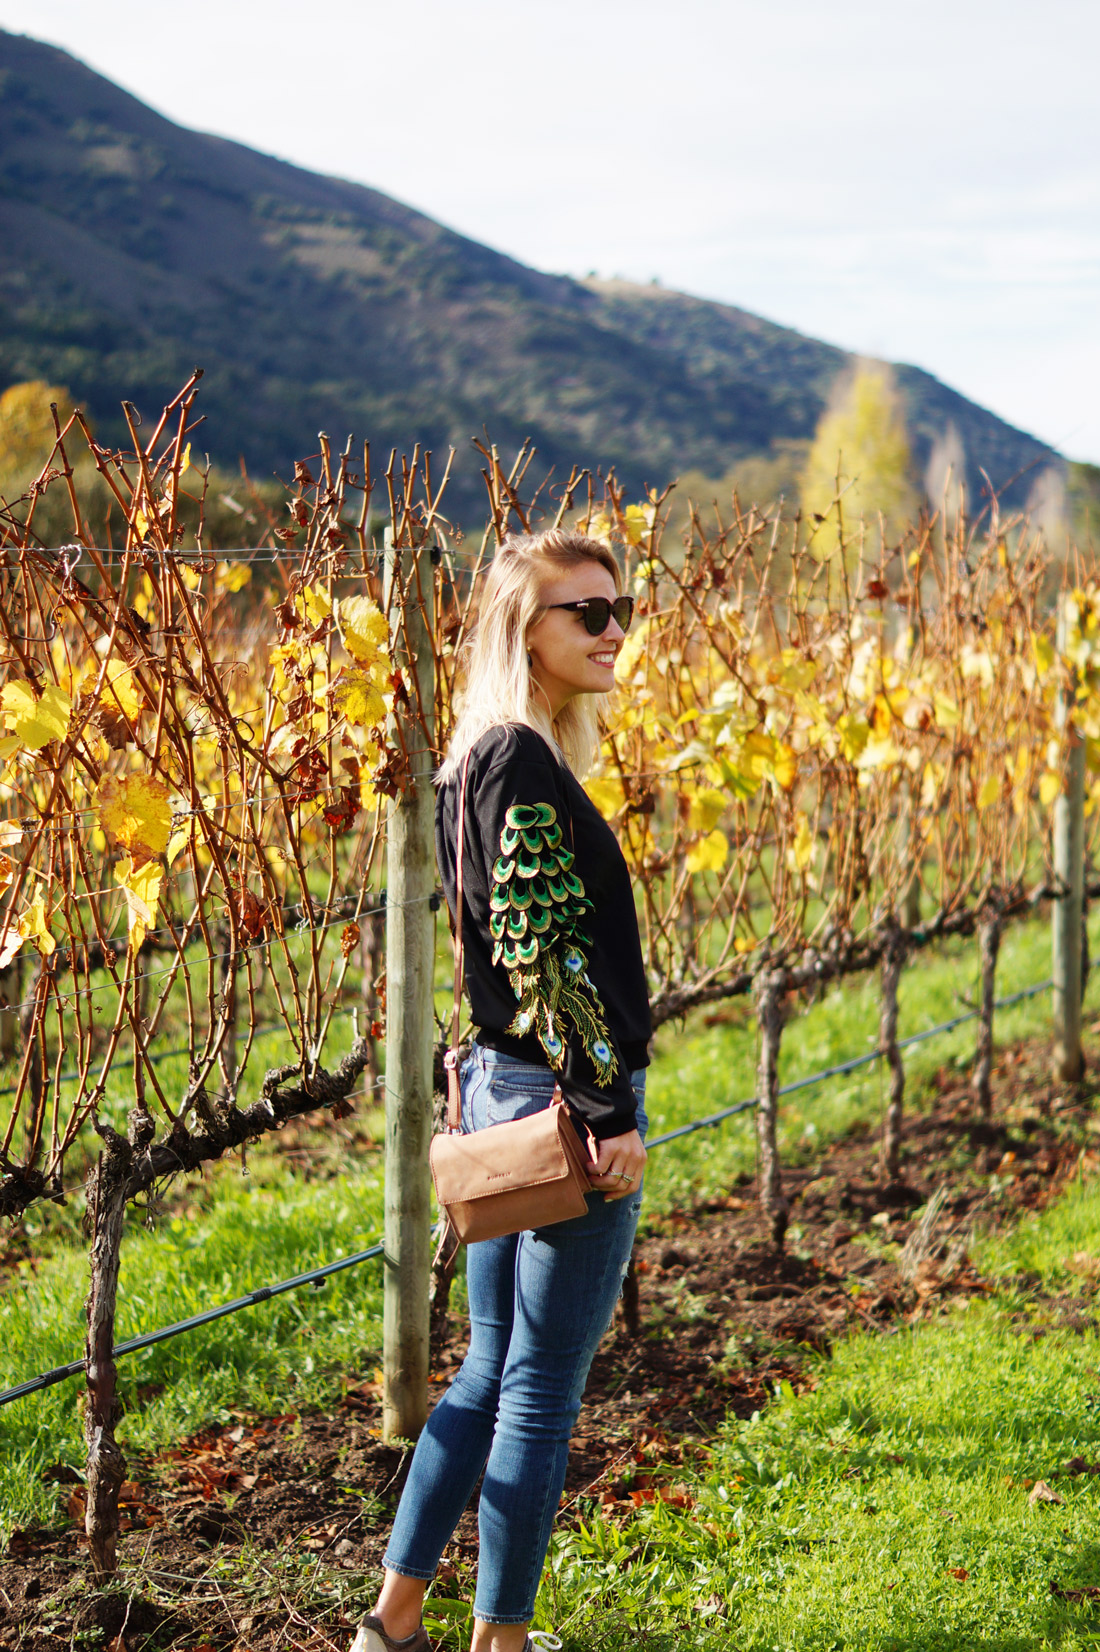 bag-at-you-fashion-blog-burkely-shoulder-bag-and-dezzal-sweater